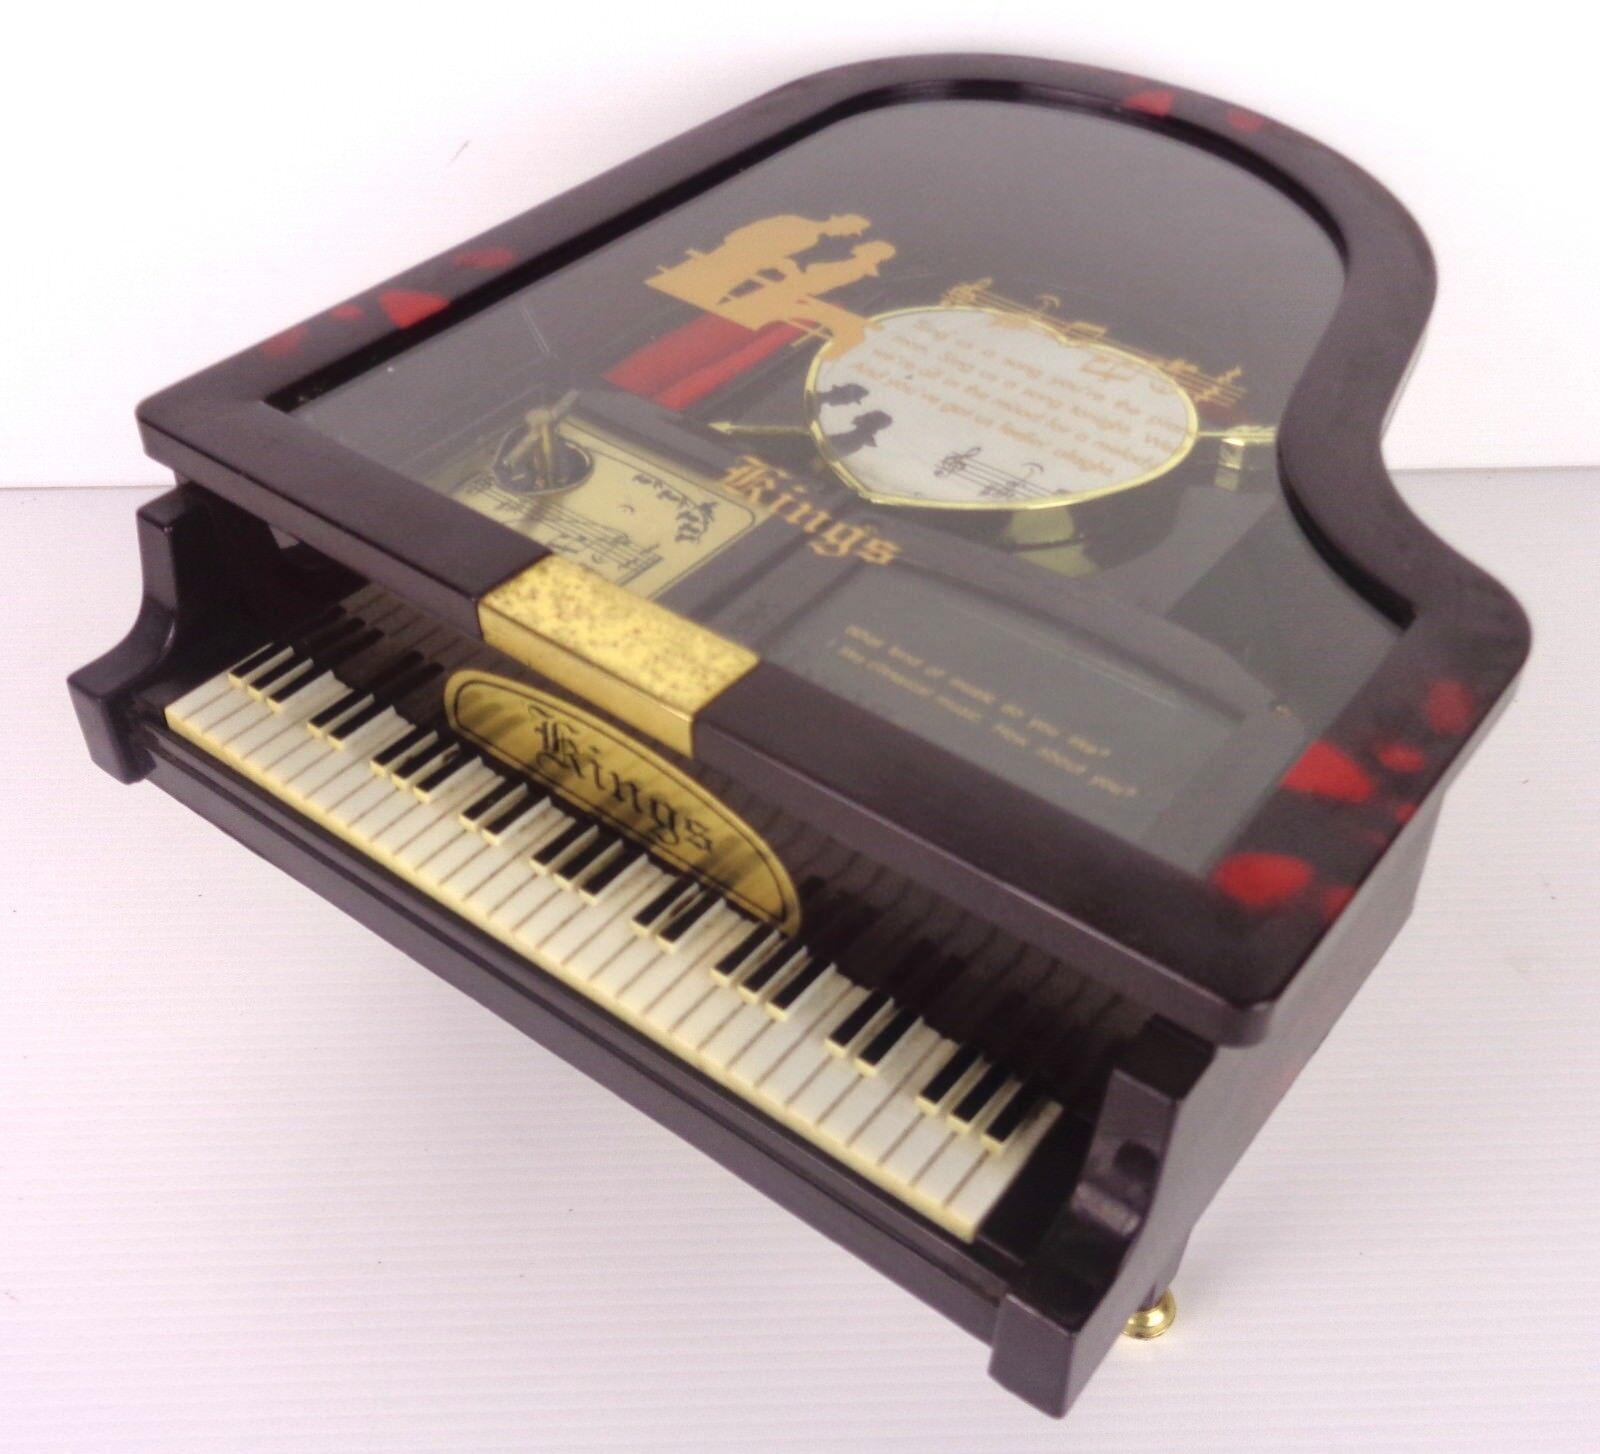 Ringe klavier carillon vintage mit spiegel